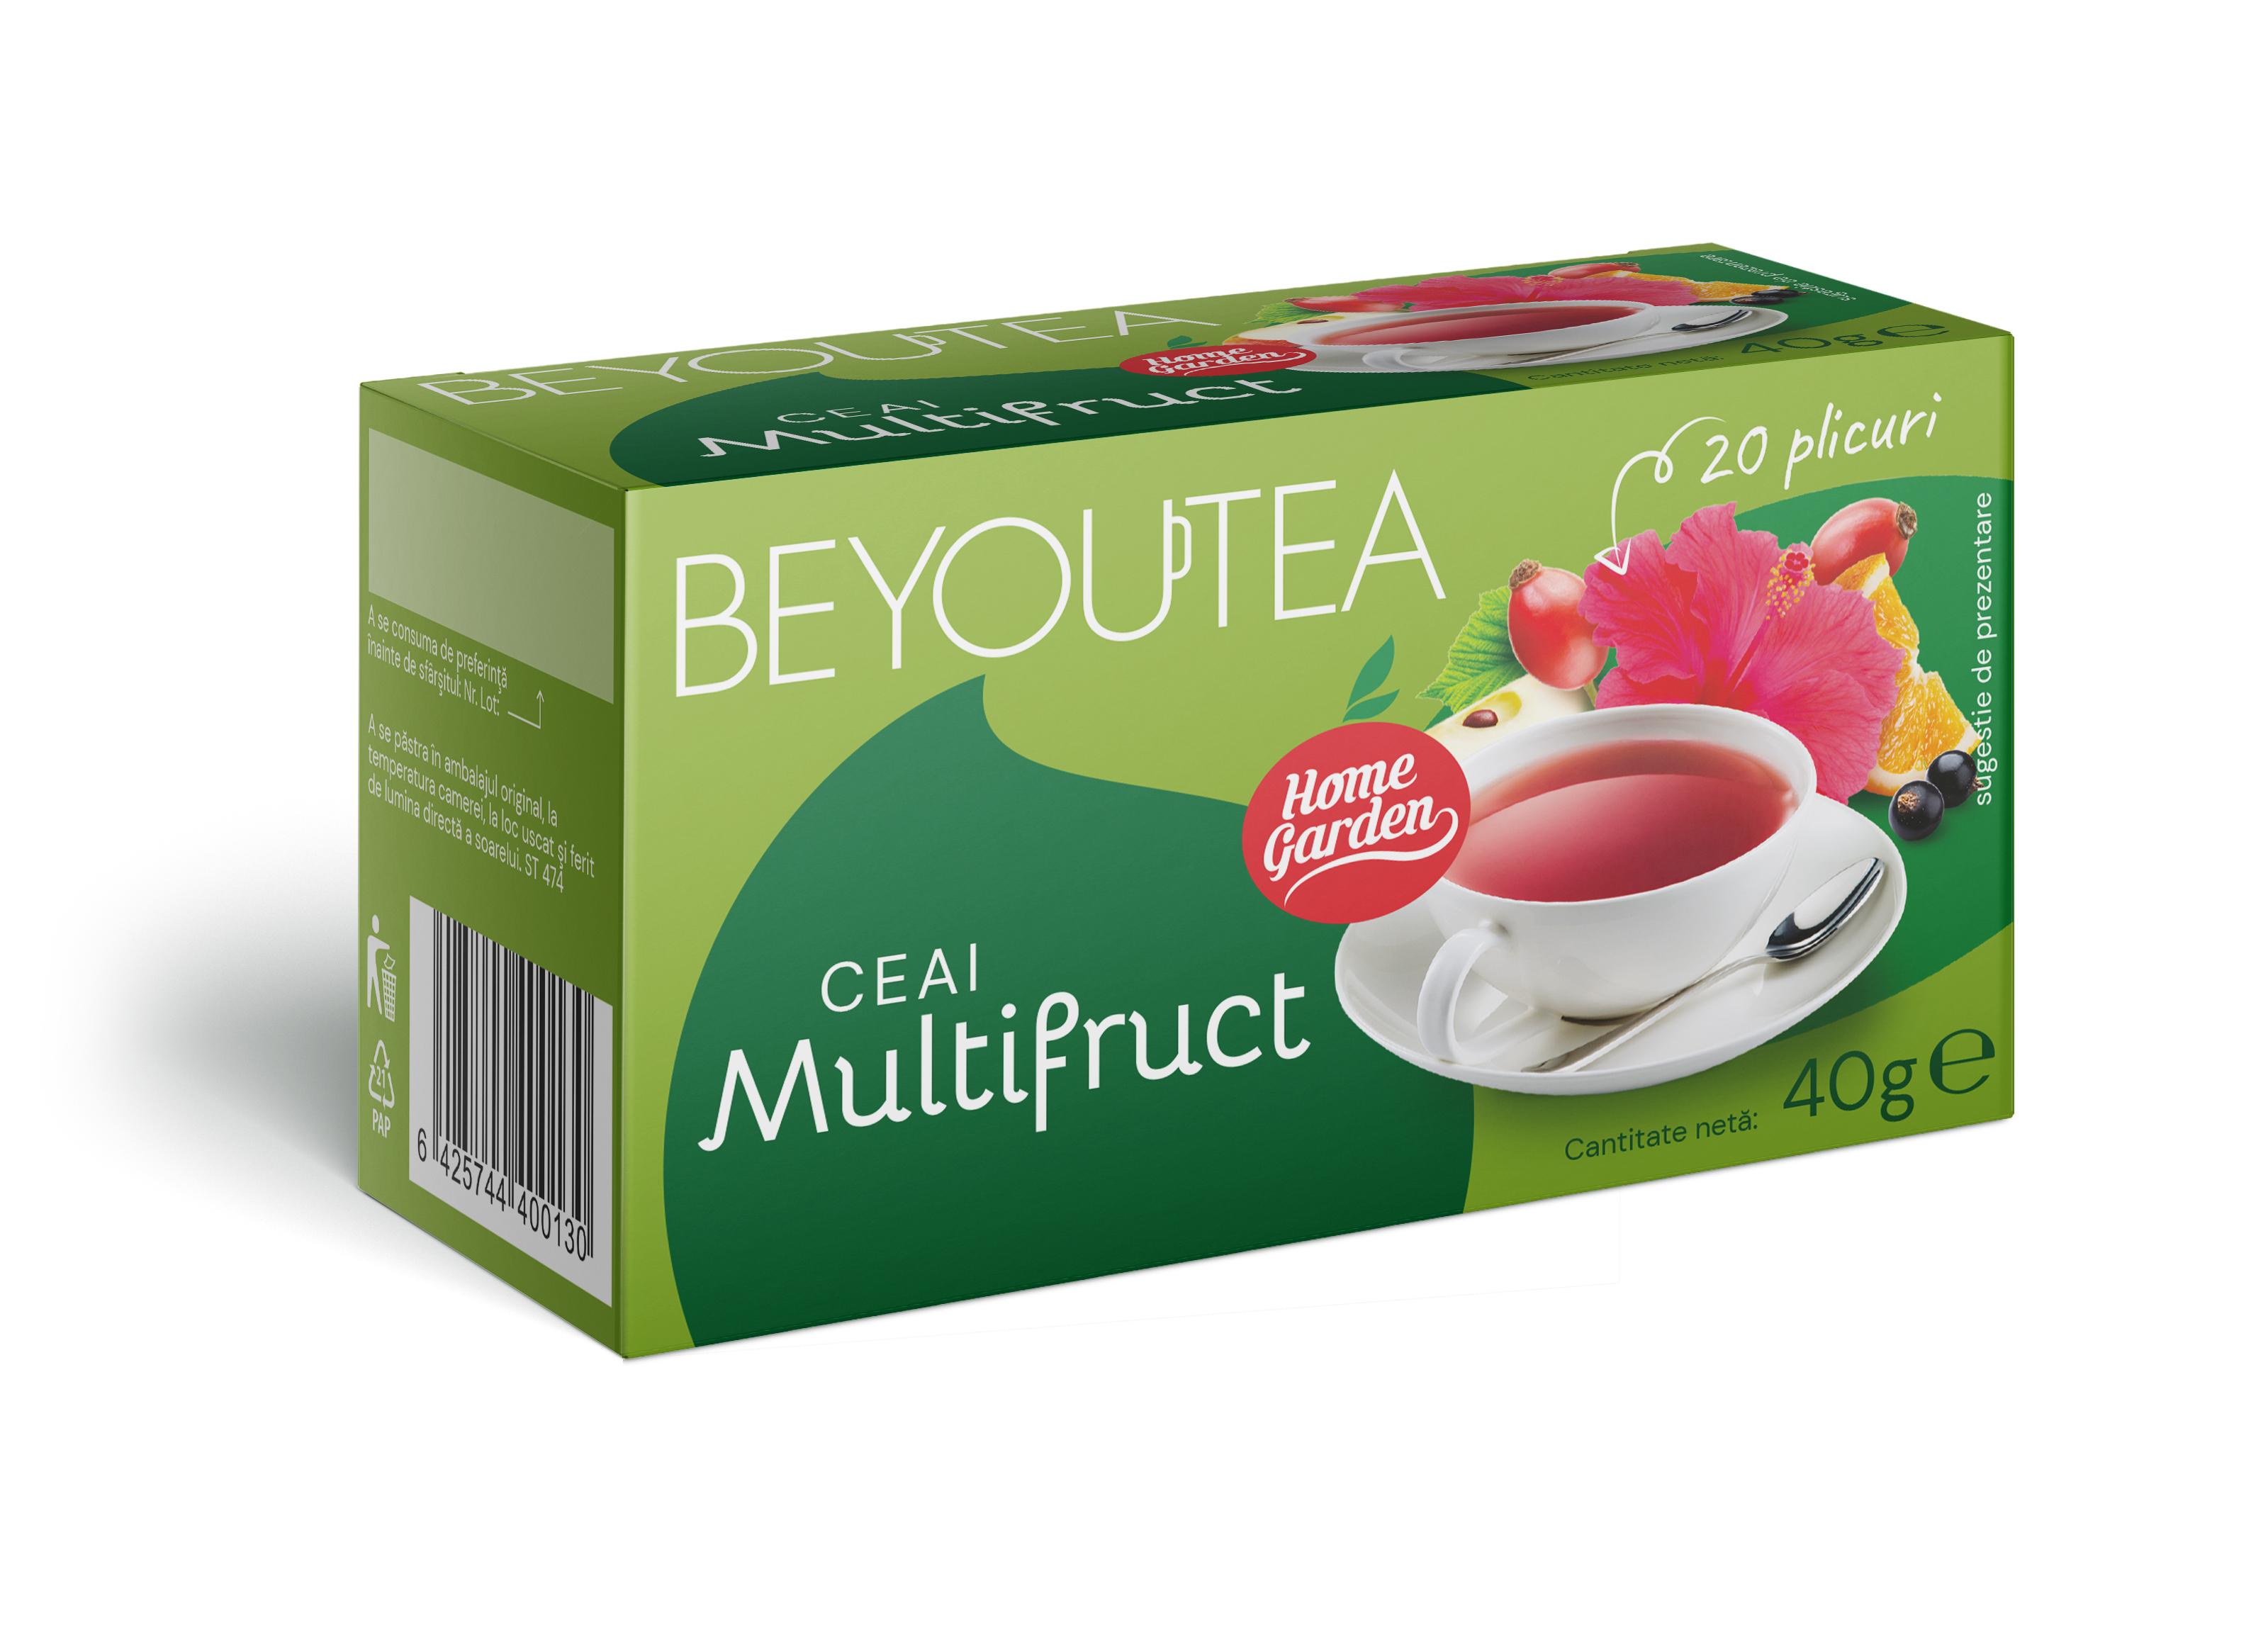 BEYOUTEA Classic Multifructe